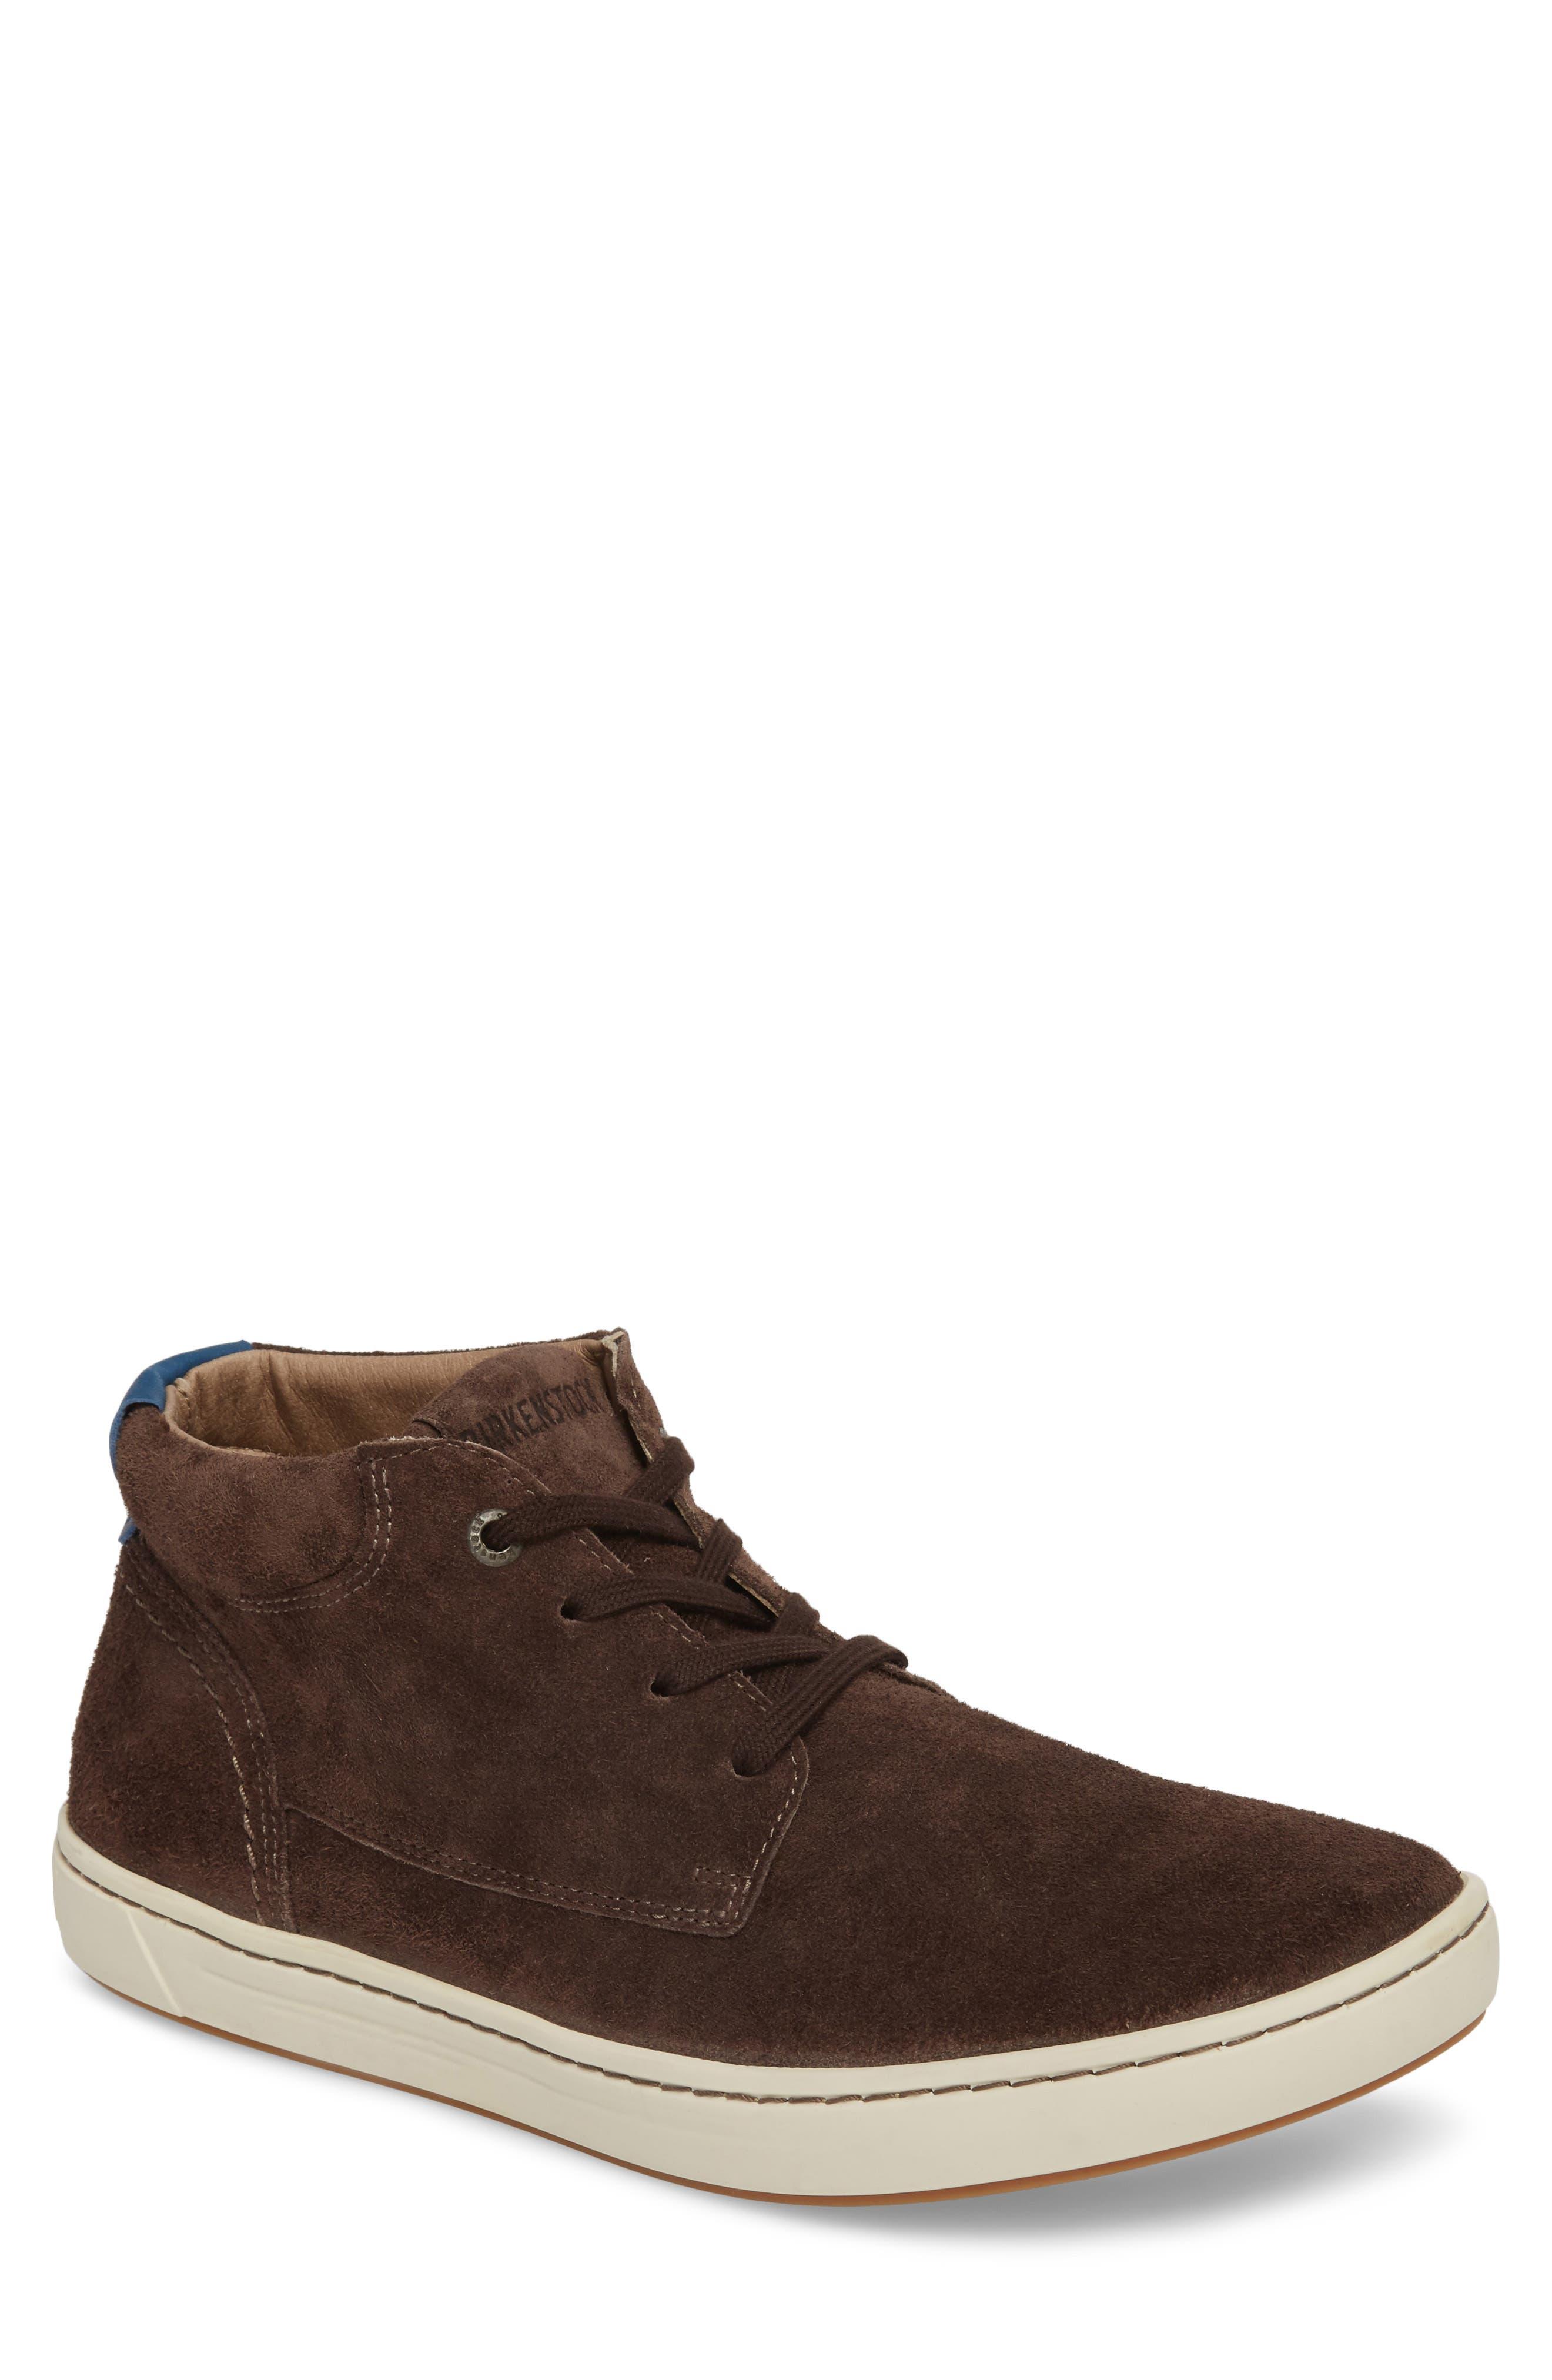 Birkenstock Brandon Sneaker, Brown